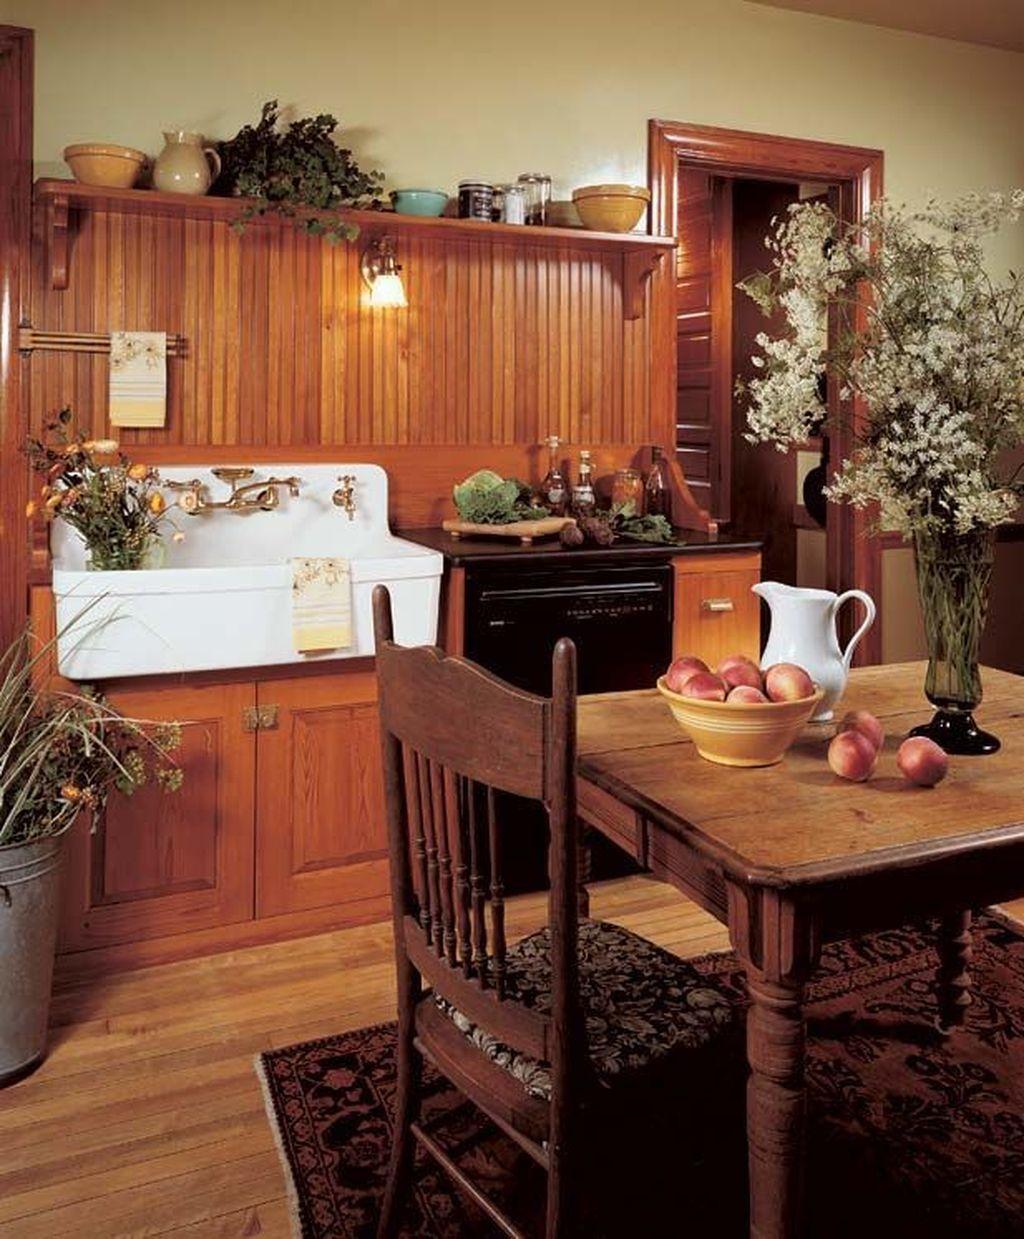 21 Victorian Style Kitchen Design And Ideas: 35 Amazing Victorian Farmhouse Design Ideas Best To Copy